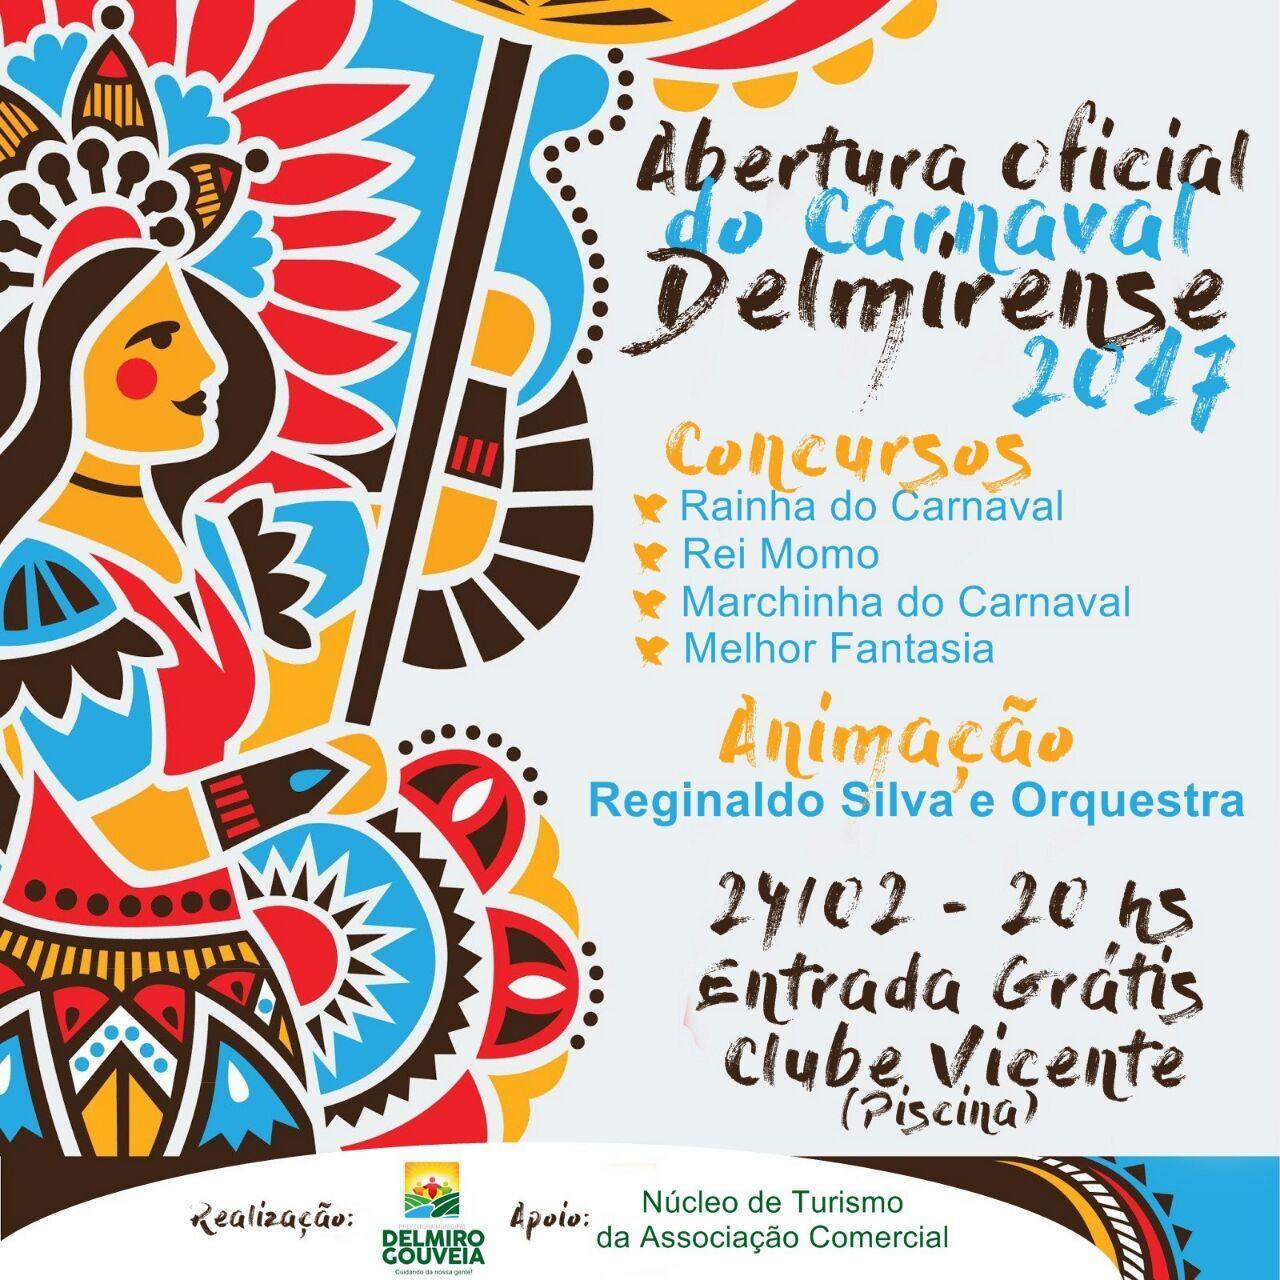 Abertura Oficial do Carnaval                 Clube Vicente  Piscina